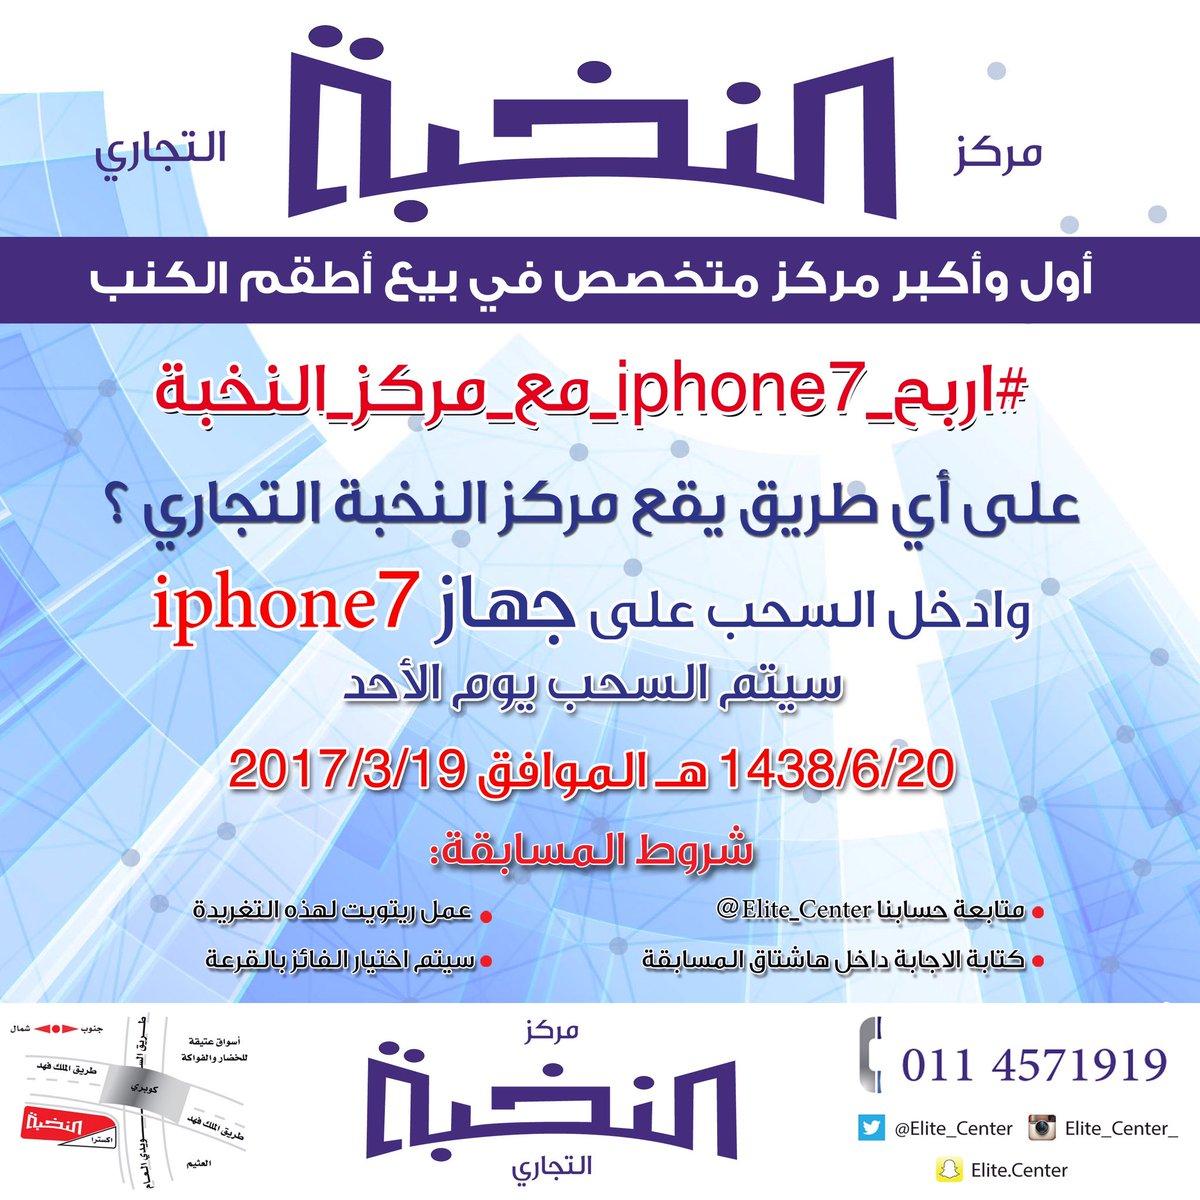 46fb759d5 #اربح_iphone7_مع_مركز_النخبةpic.twitter.com/7bMYTzfSlO